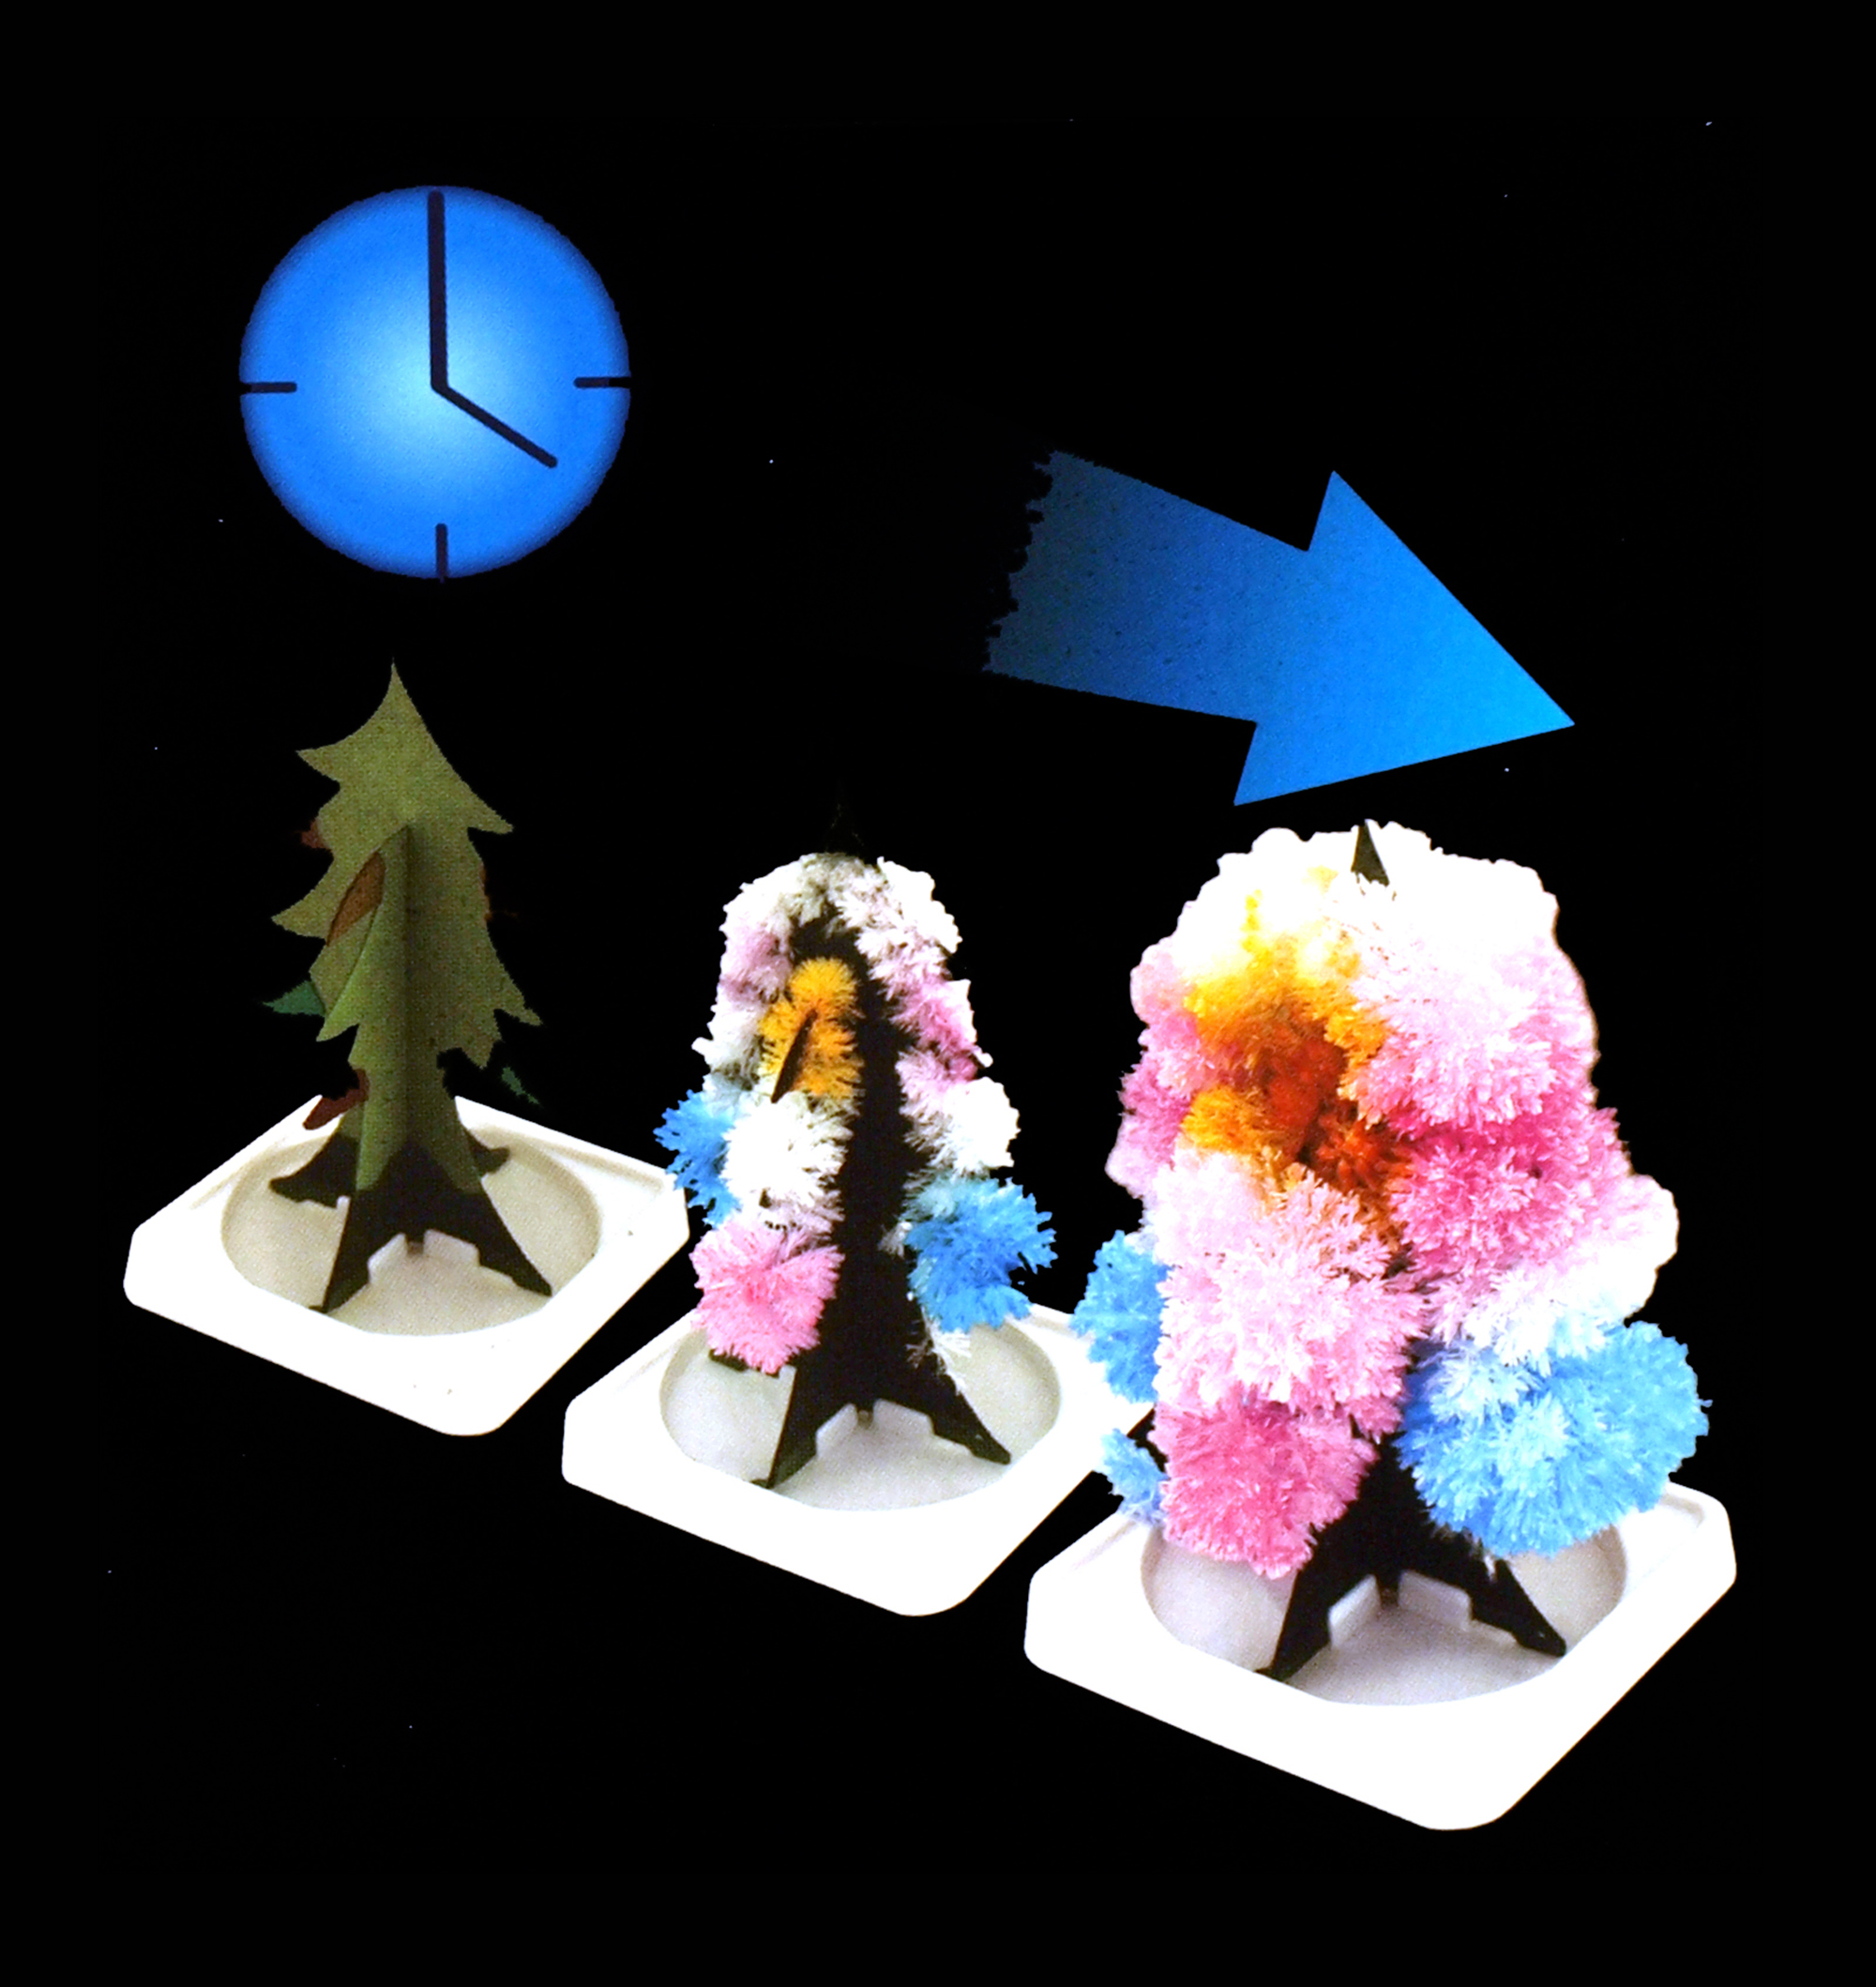 magic tree zarte kristall blumen wachsen ebay. Black Bedroom Furniture Sets. Home Design Ideas